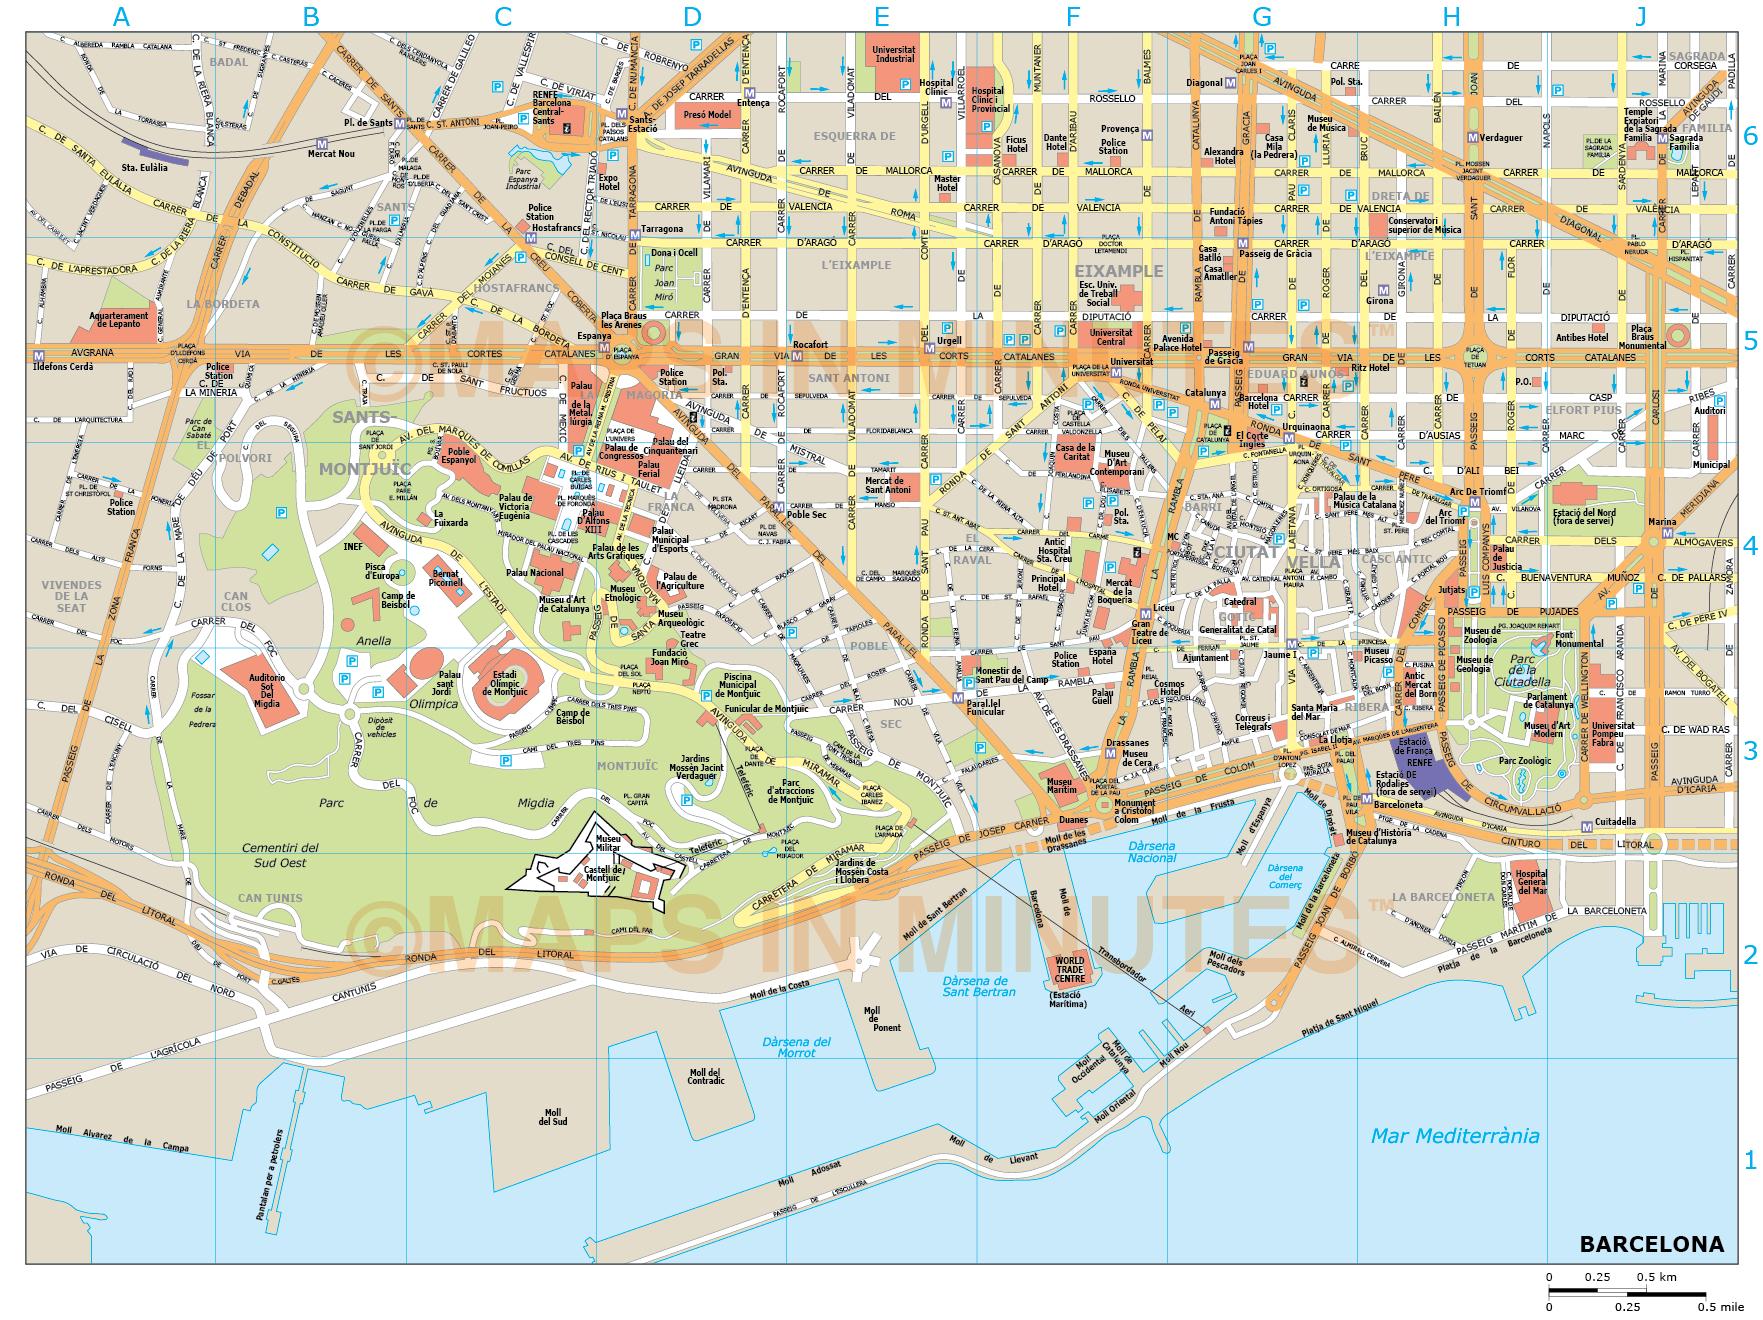 Barcelona City Map In Illustrator Cs Or Pdf Format - Barcelona City Map Printable